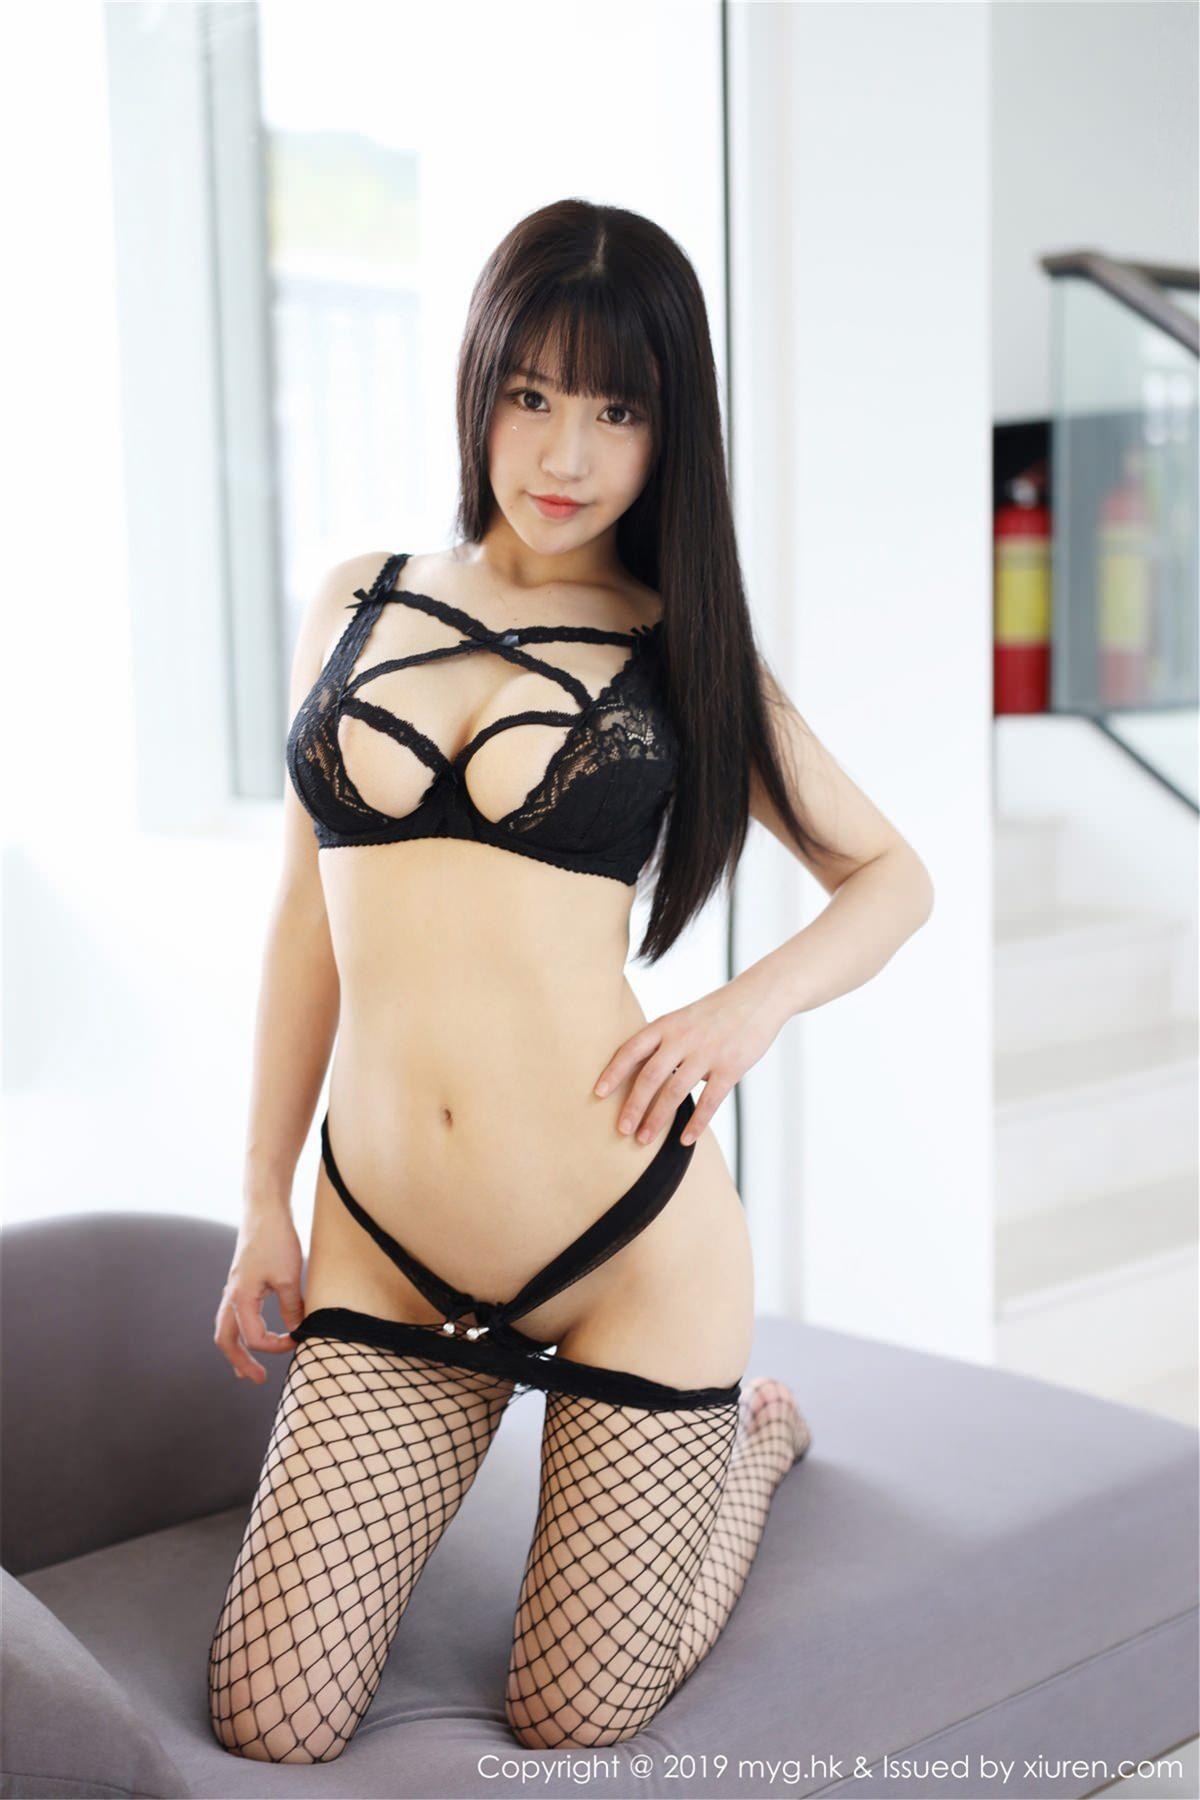 MyGirl Vol.357 65P, mygirl, Zhu Ke Er